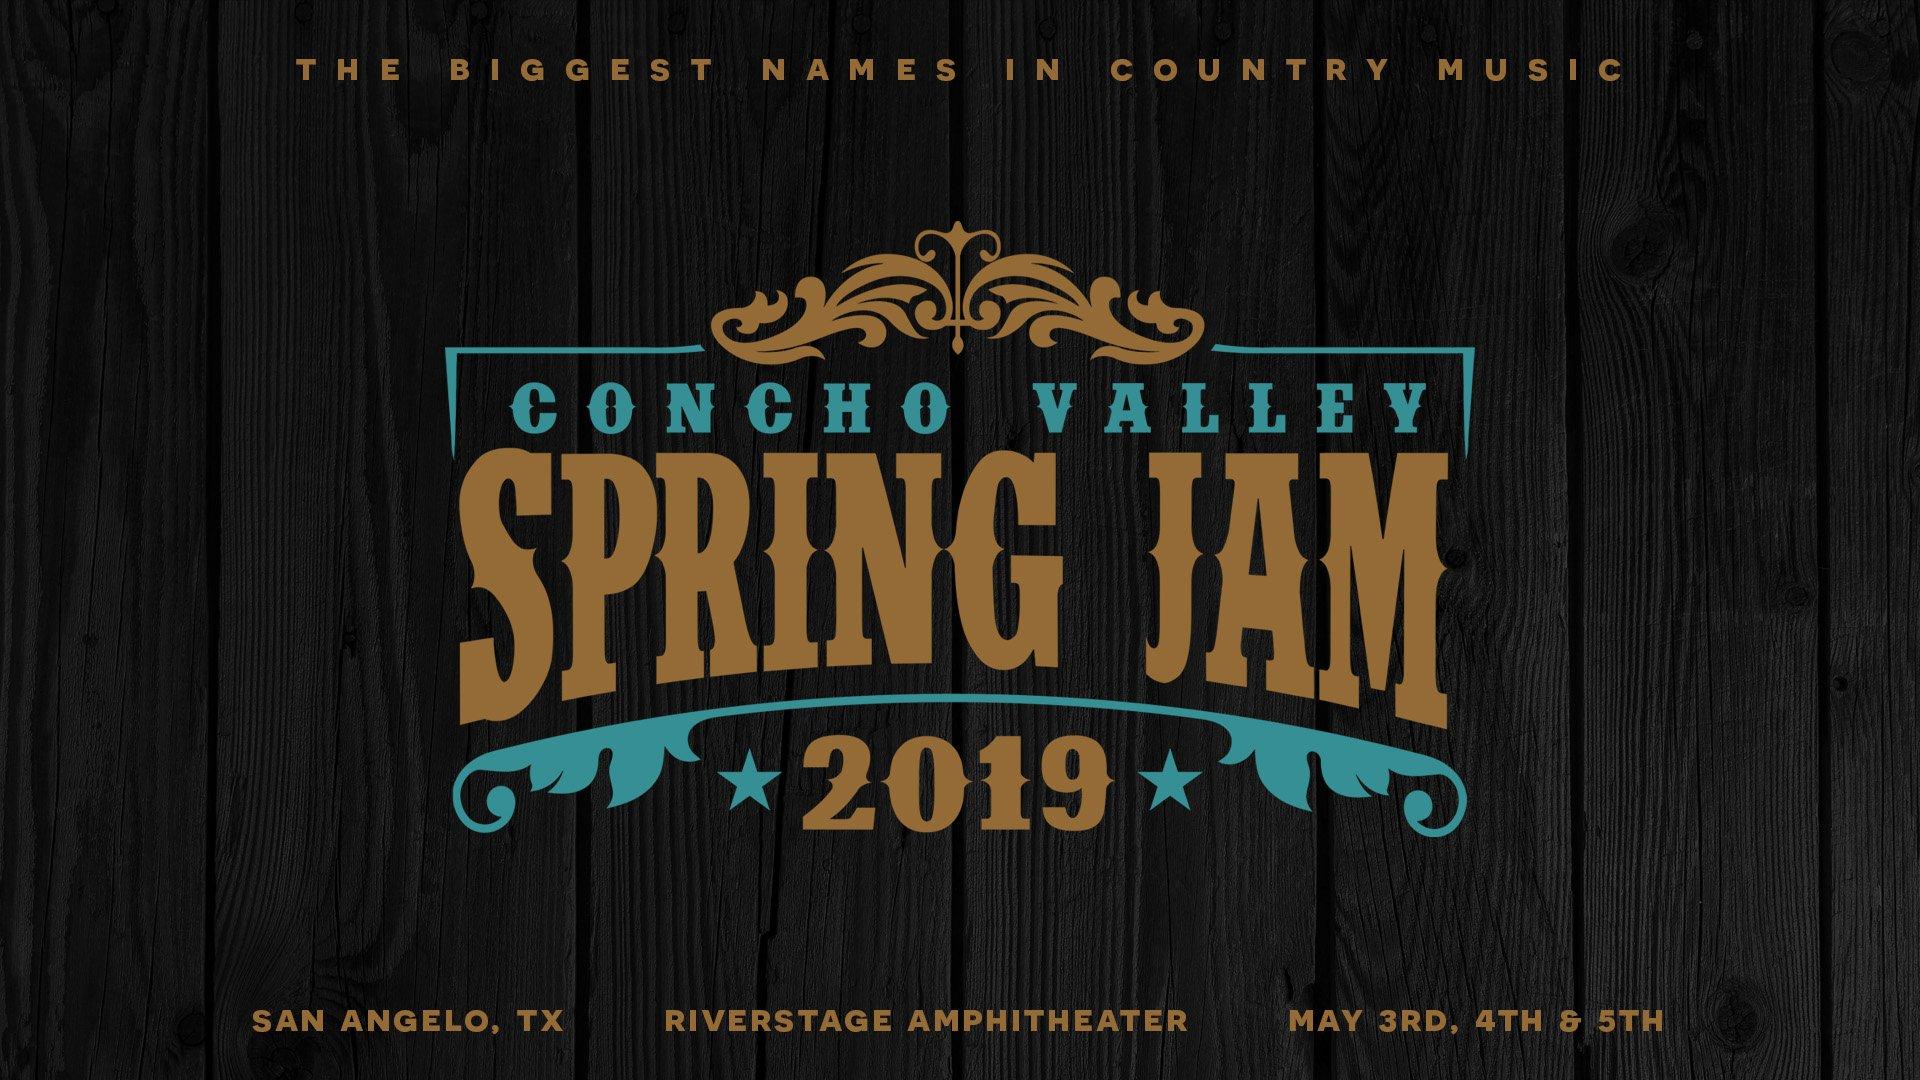 Concho Valley Spring Jam ConchoValleySJ